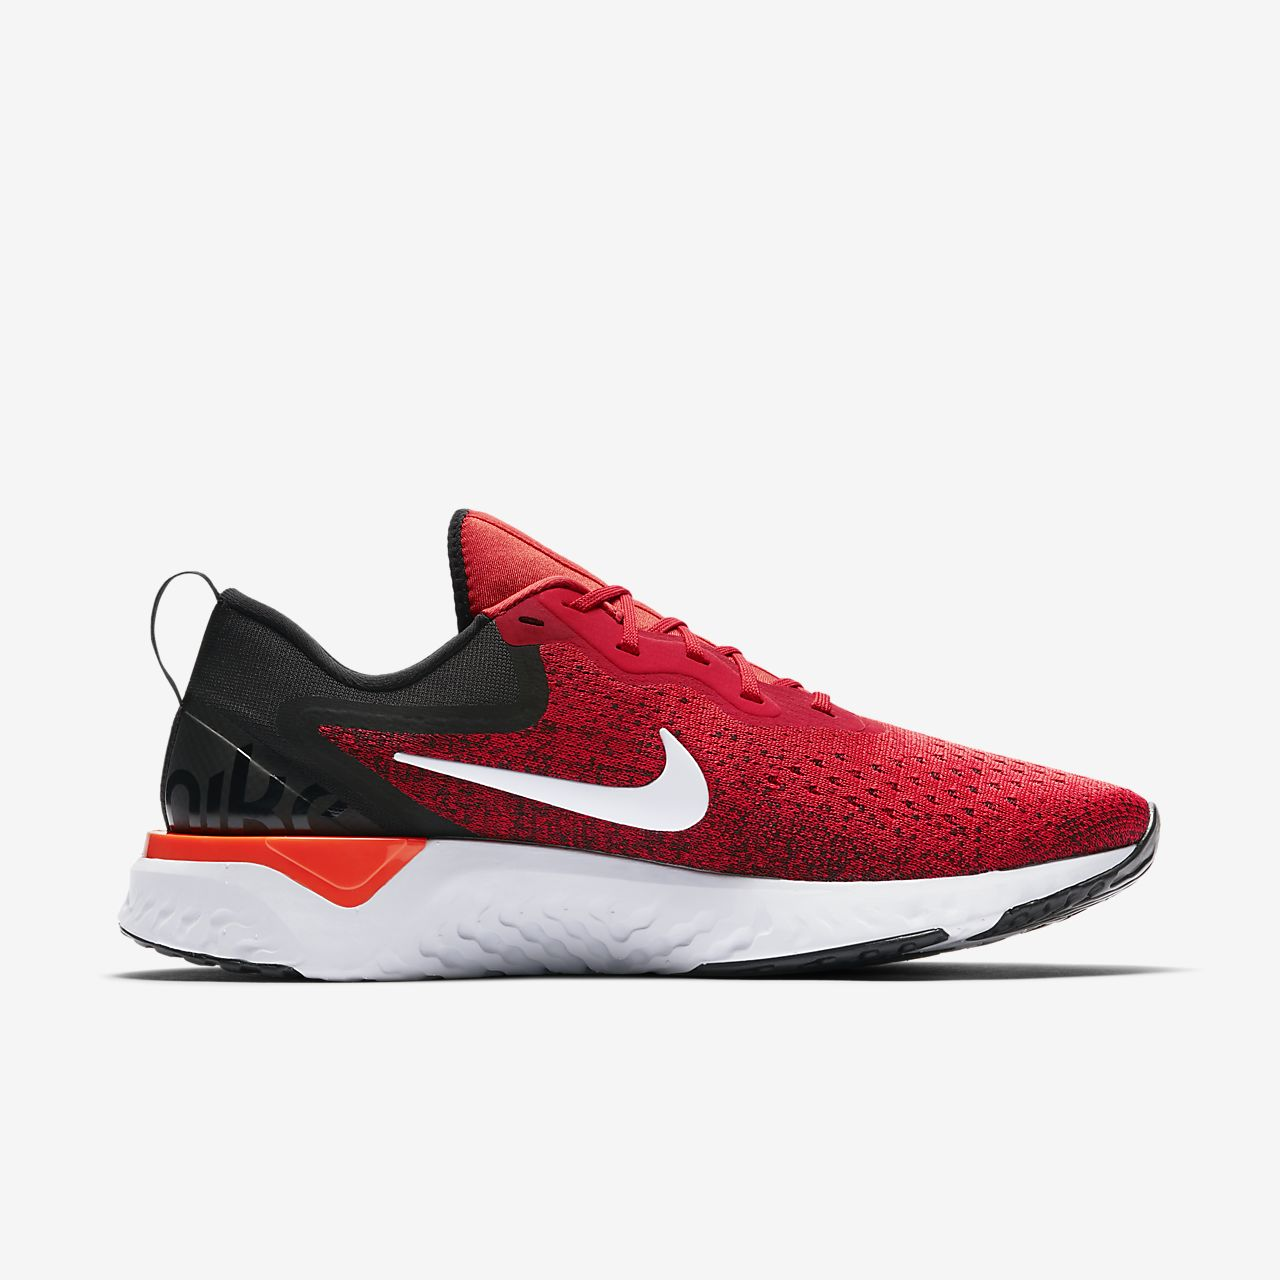 Nike Odyssey React Habanero Red/Black/Hyper Crimson Mens 2018 Running All NEW